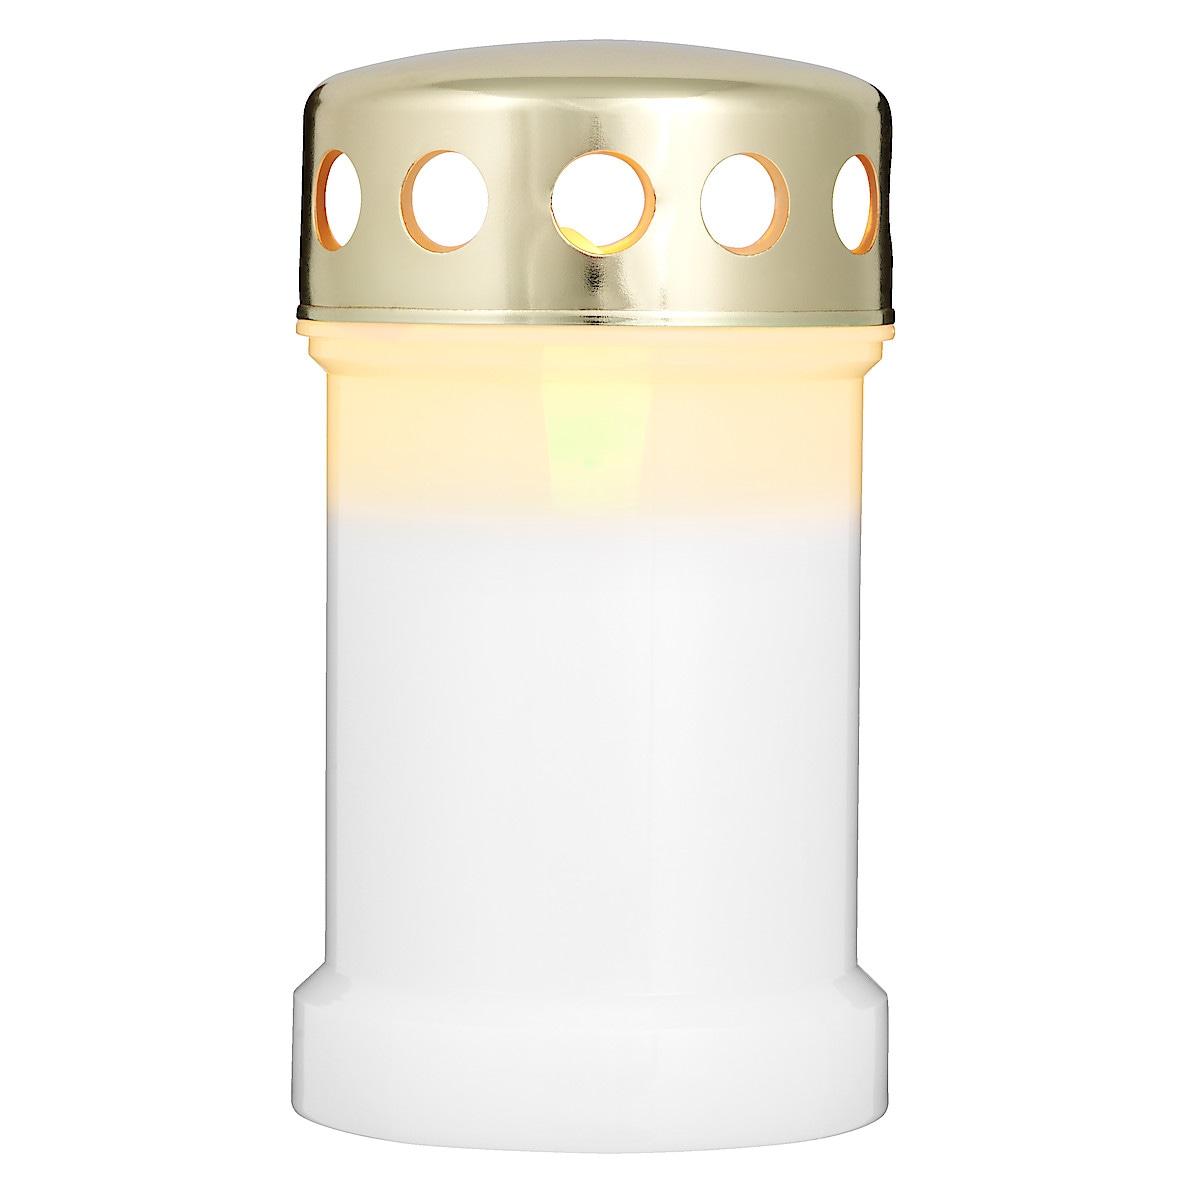 Gravljus LED